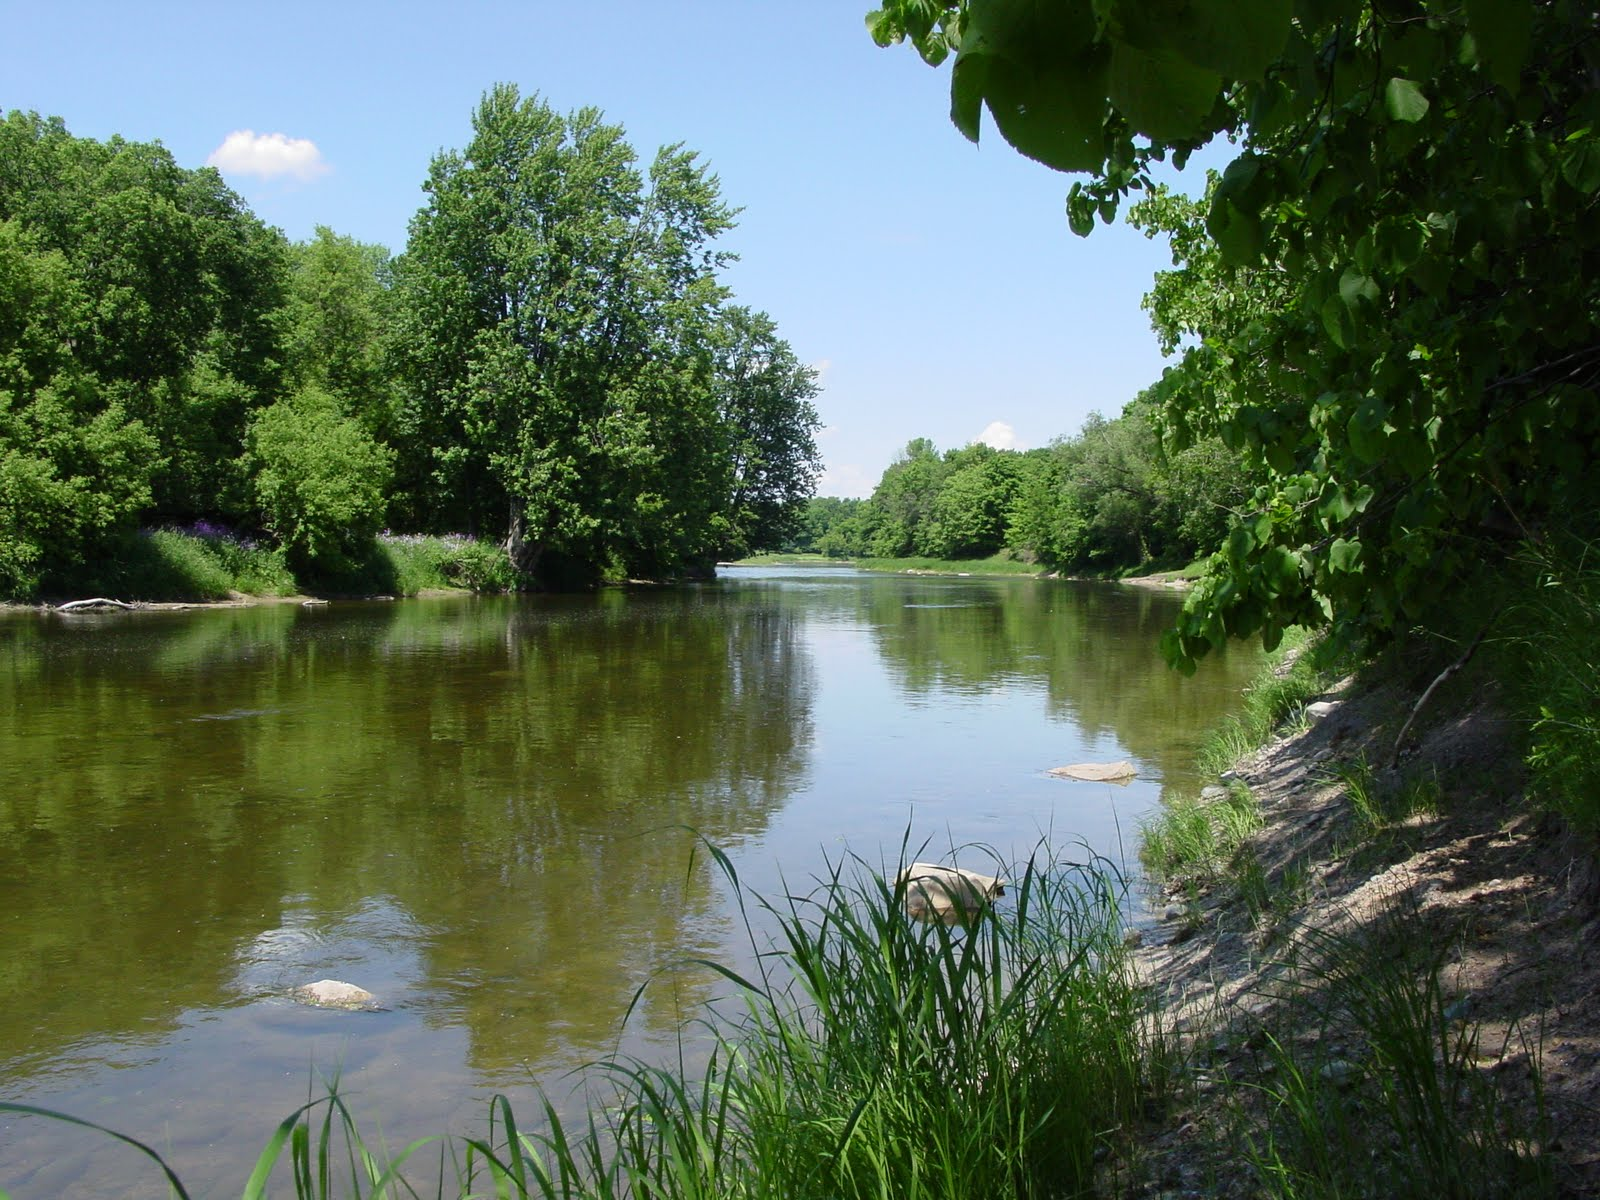 Chippewa Nature Center Summer Camps